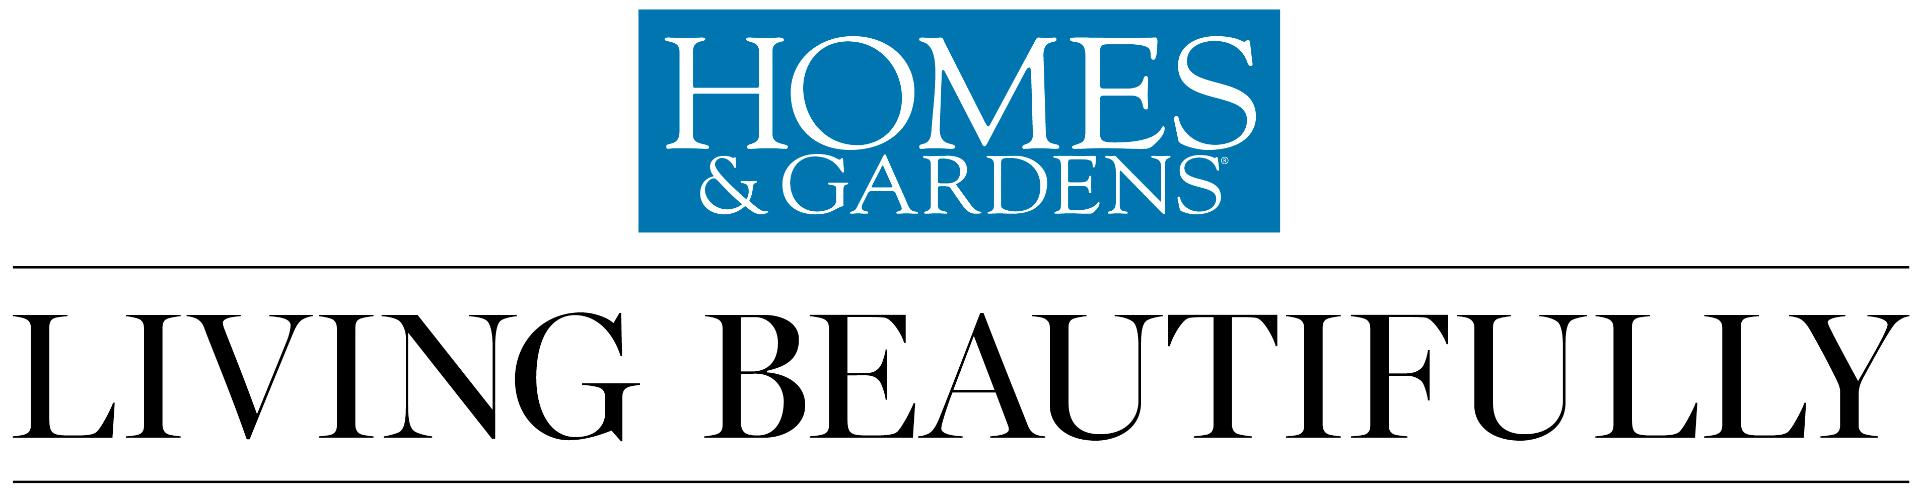 Home & Garden Living Beautifully